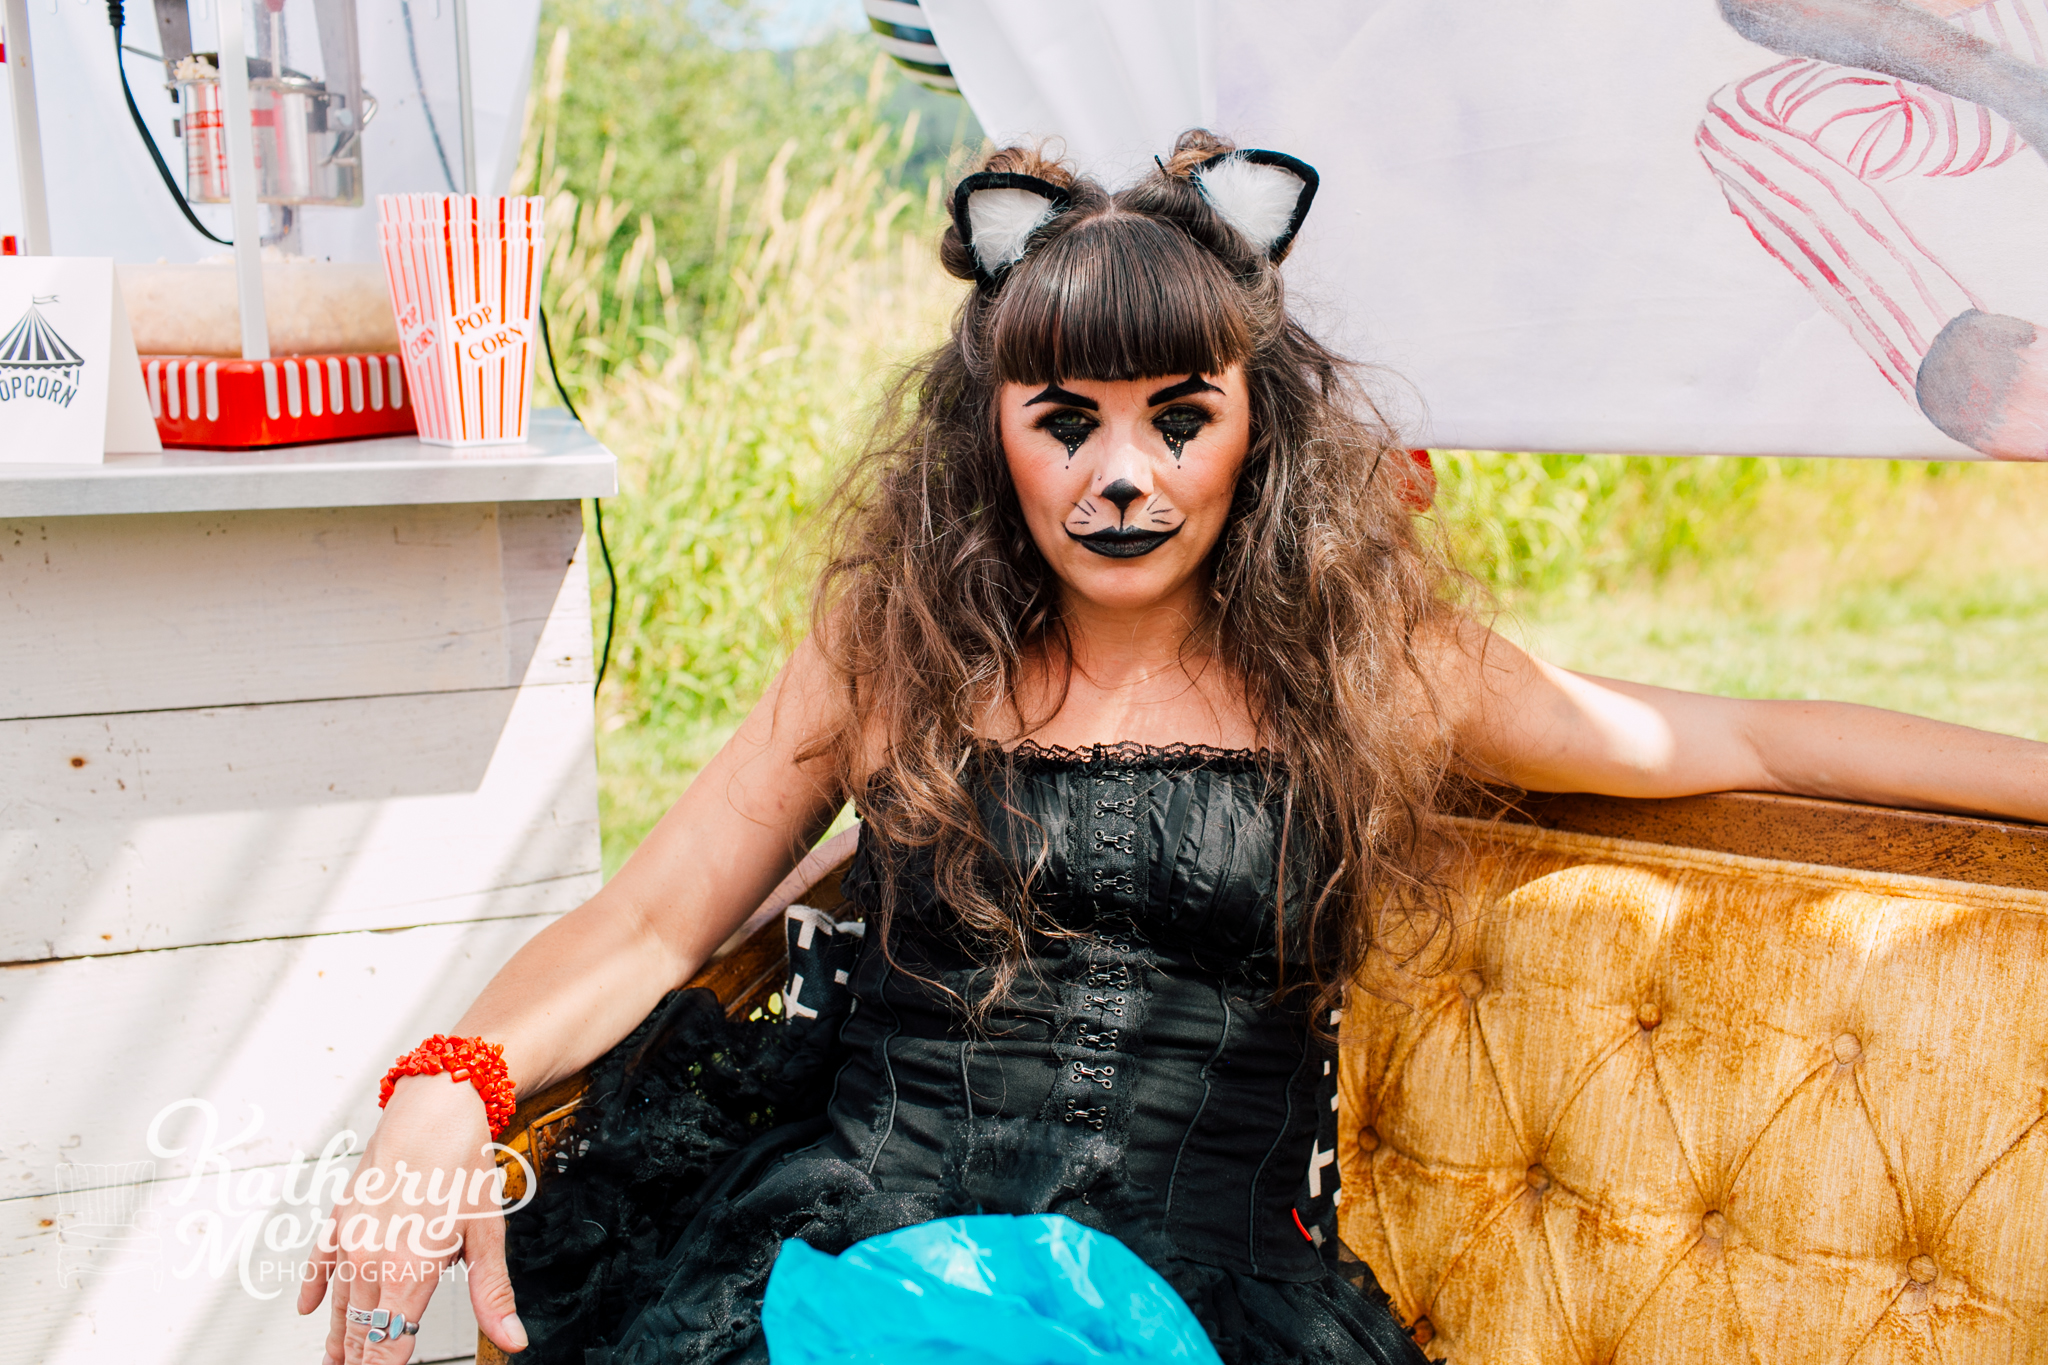 bellingham-seattle-event-photographer-vintage-circus-styled-katheryn-moran-125.jpg